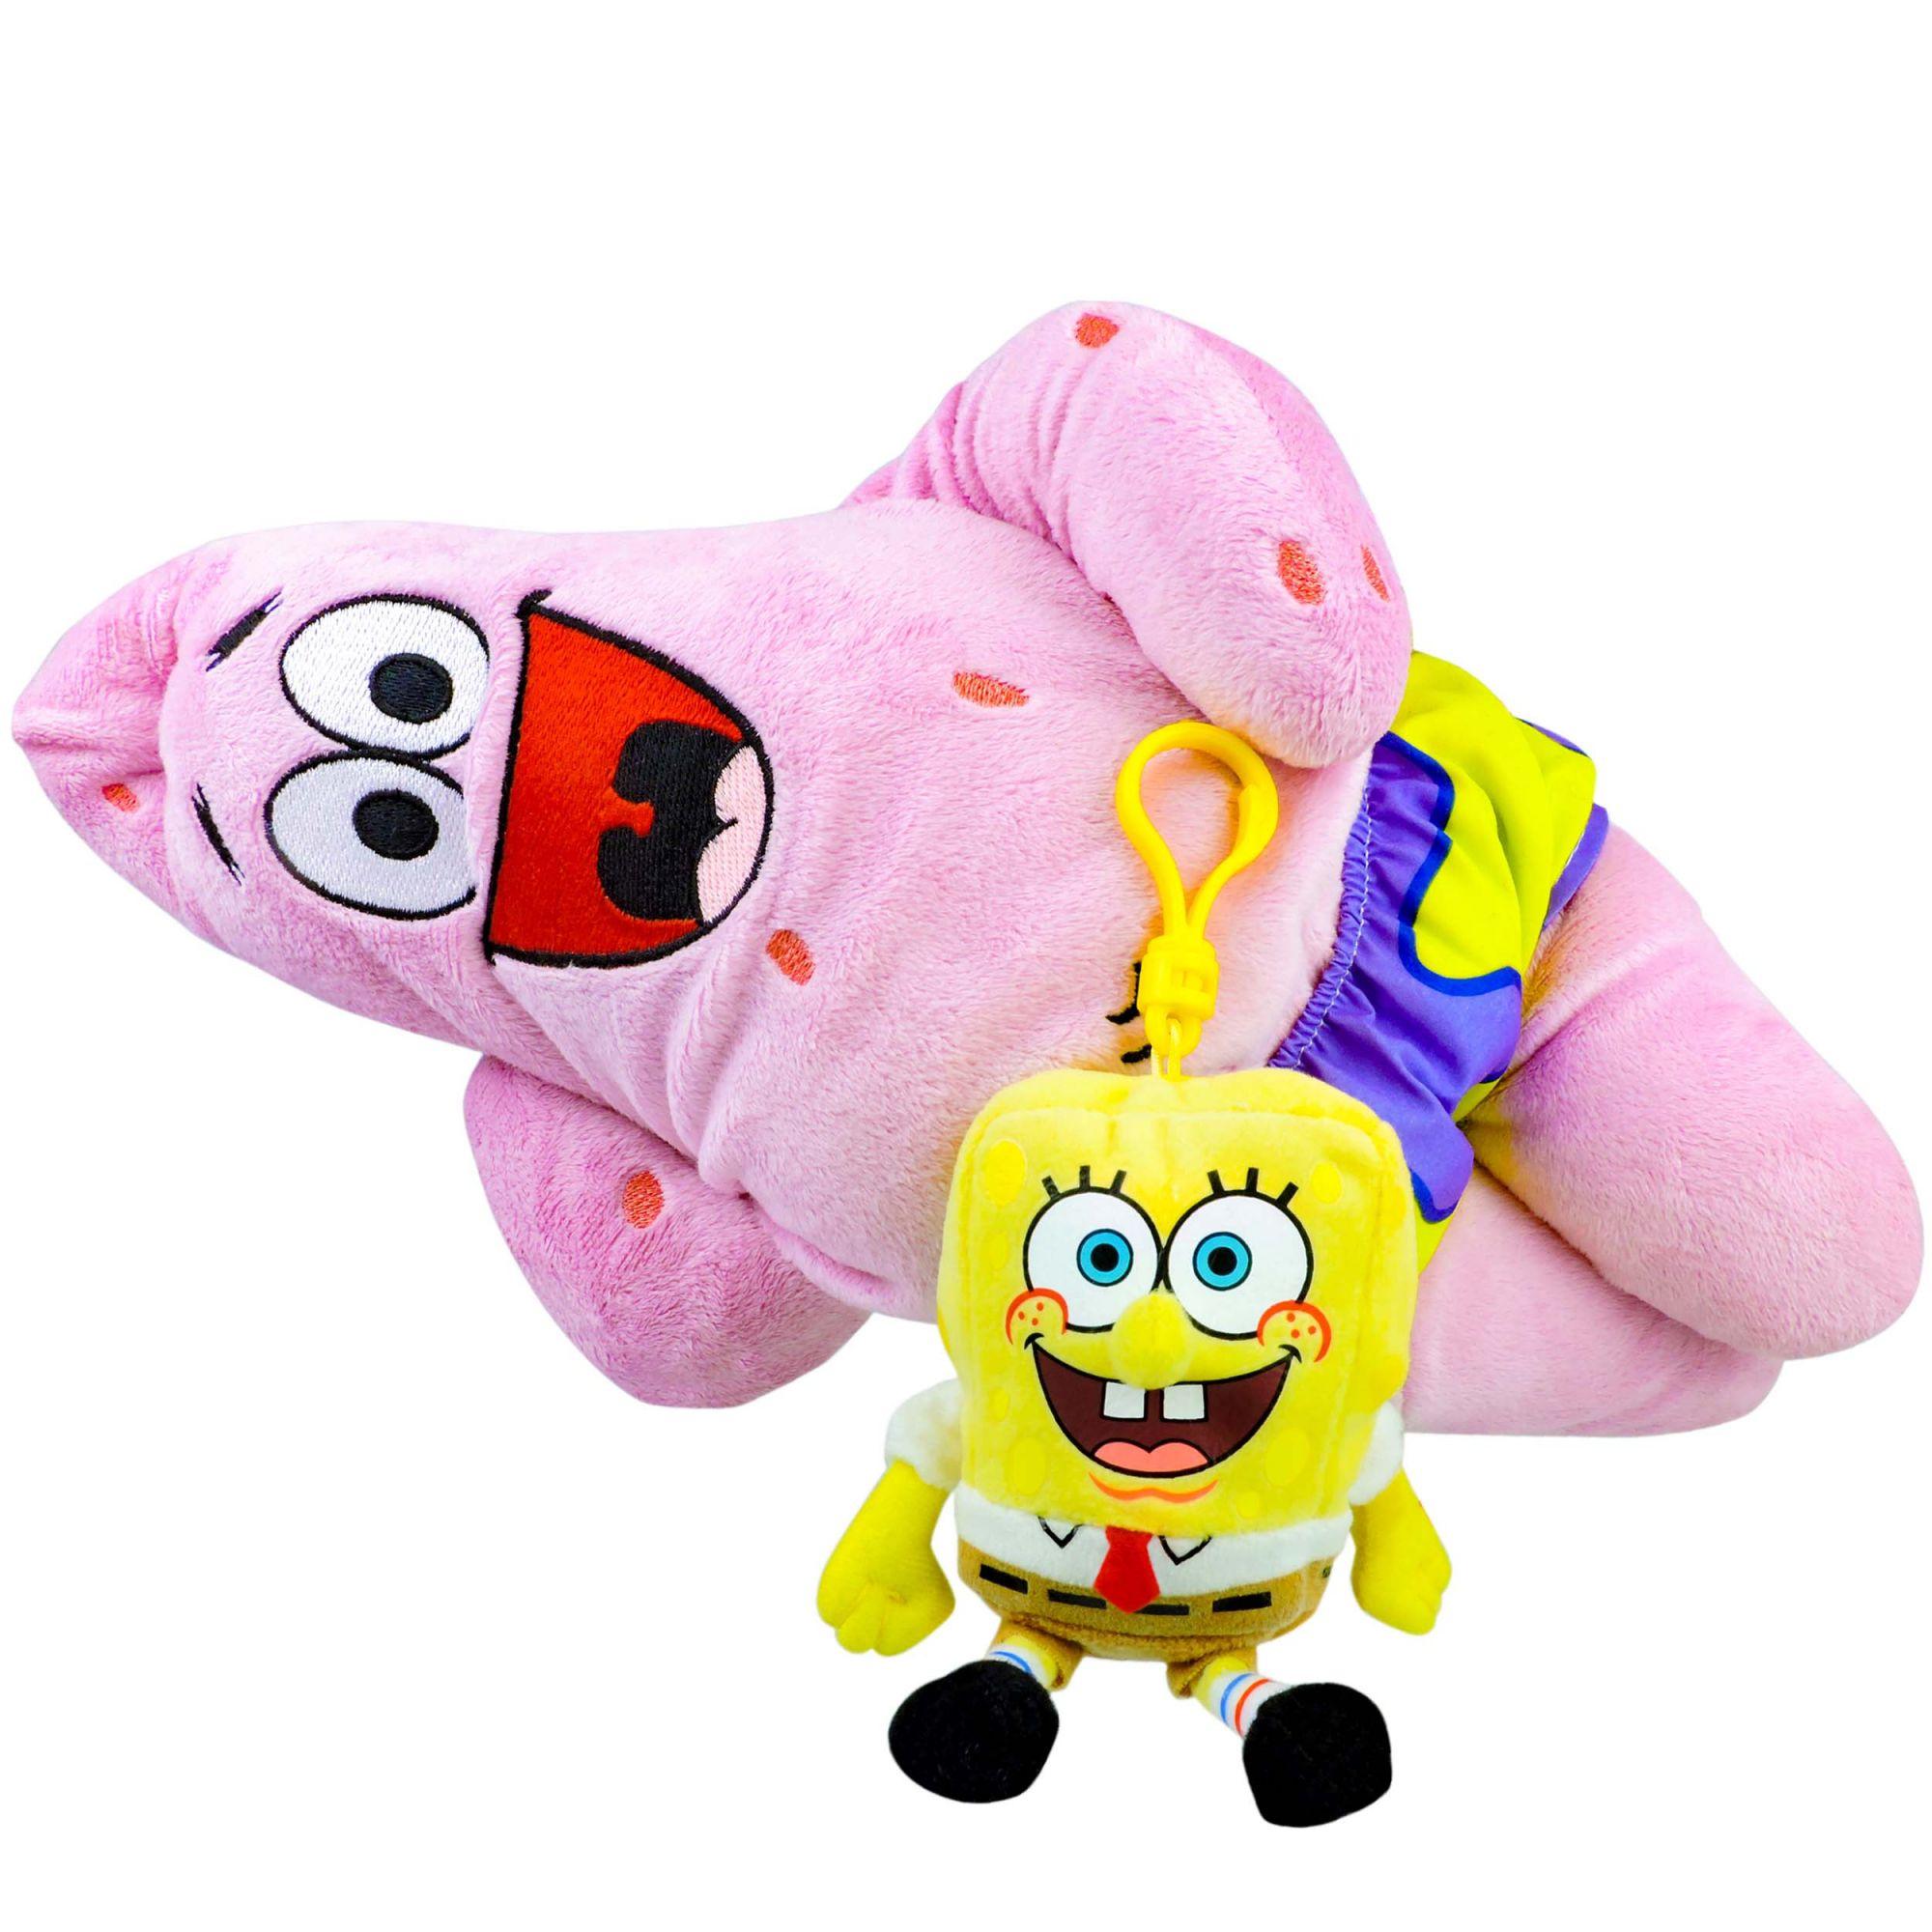 Boneco De Pelúcia Patrick E Bob Esponja Chaveiro Nickelodeon